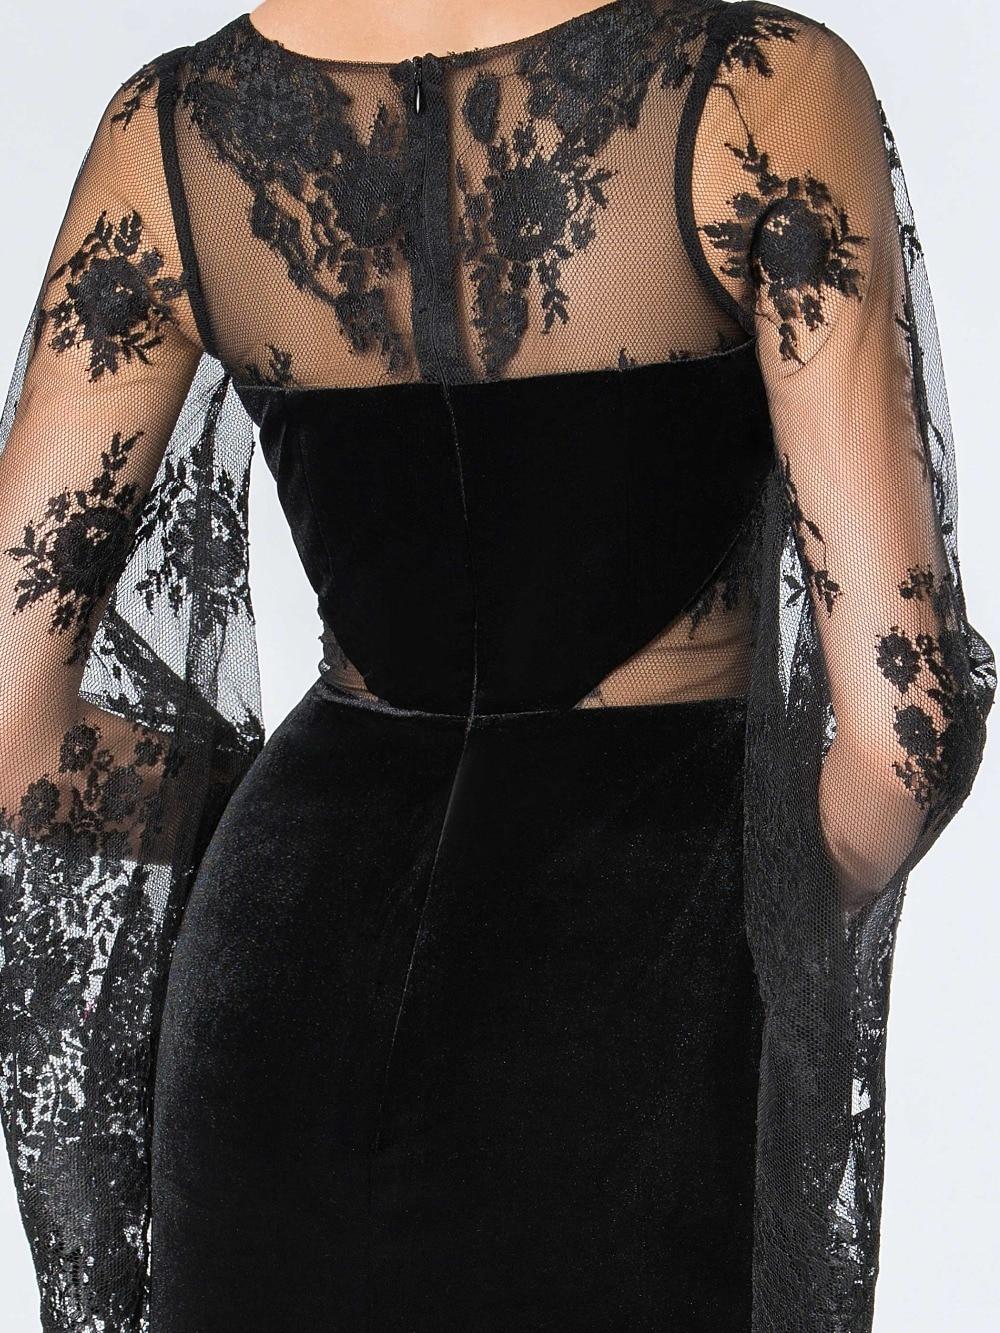 Dressv Vintage čipke muslimanske večernje haljine plašt O-vrat - Haljina za posebne prigode - Foto 6